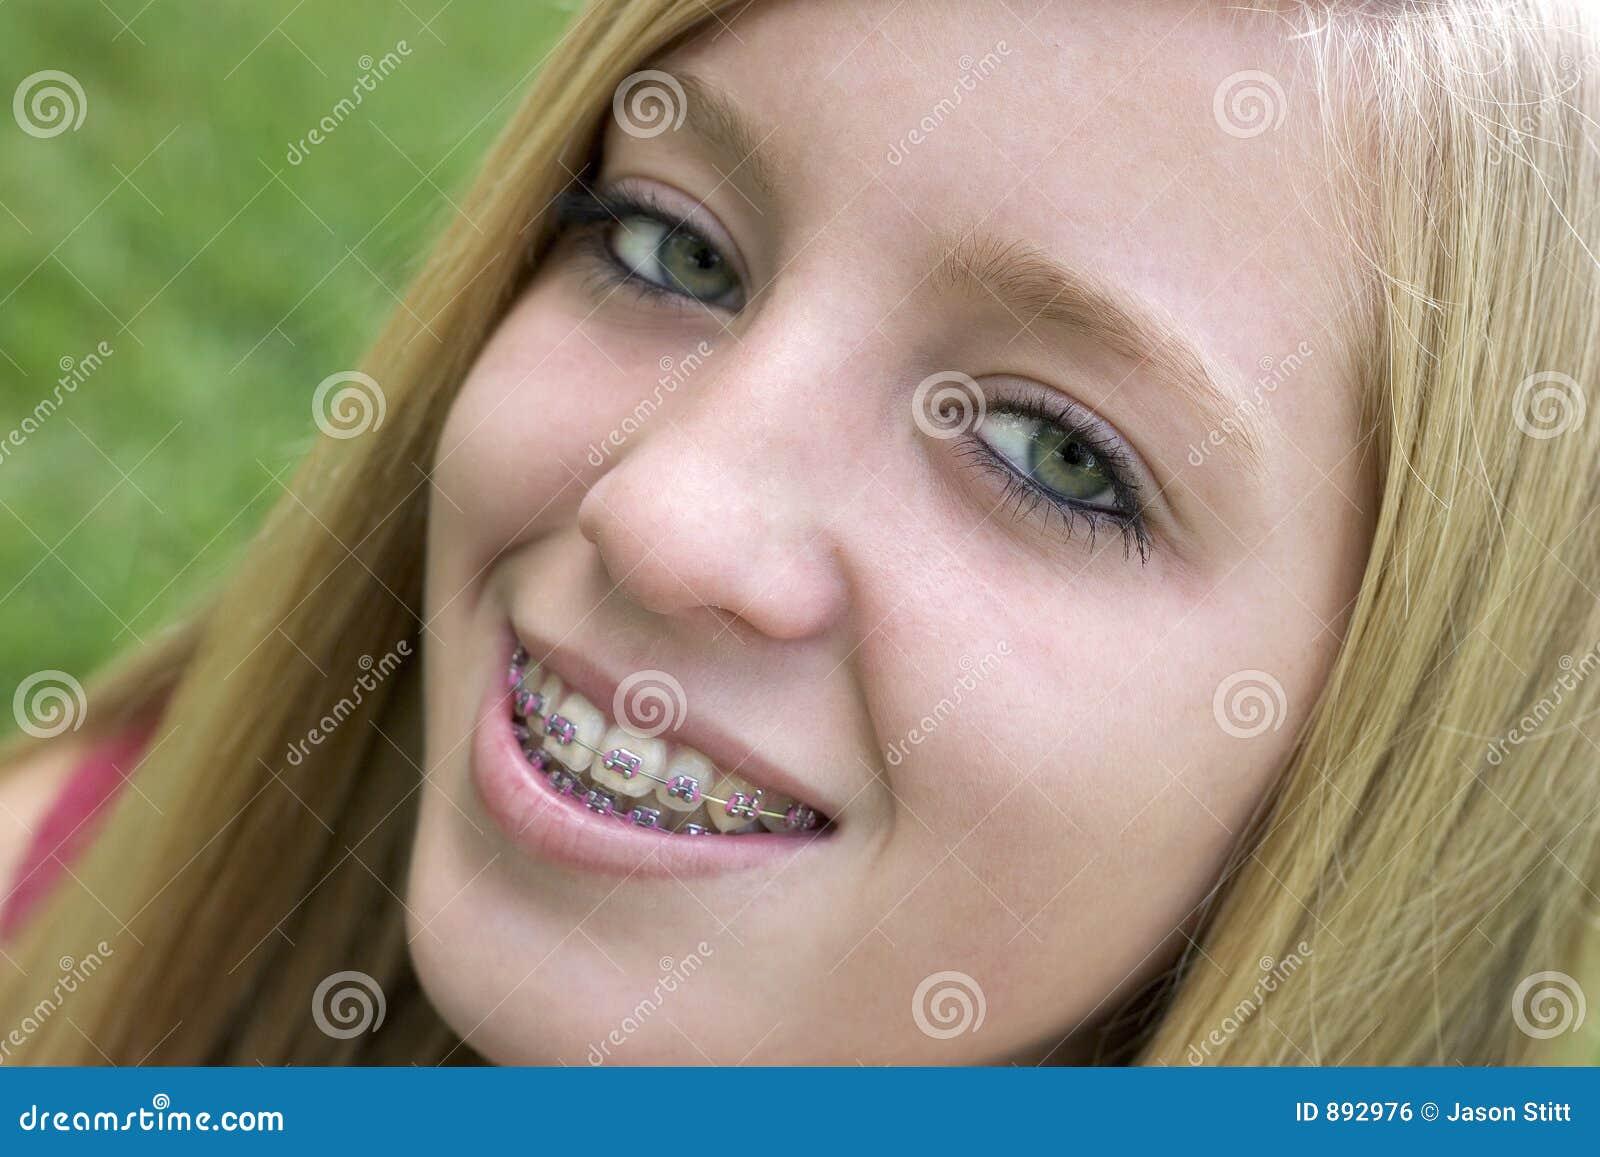 girls with braces sex free